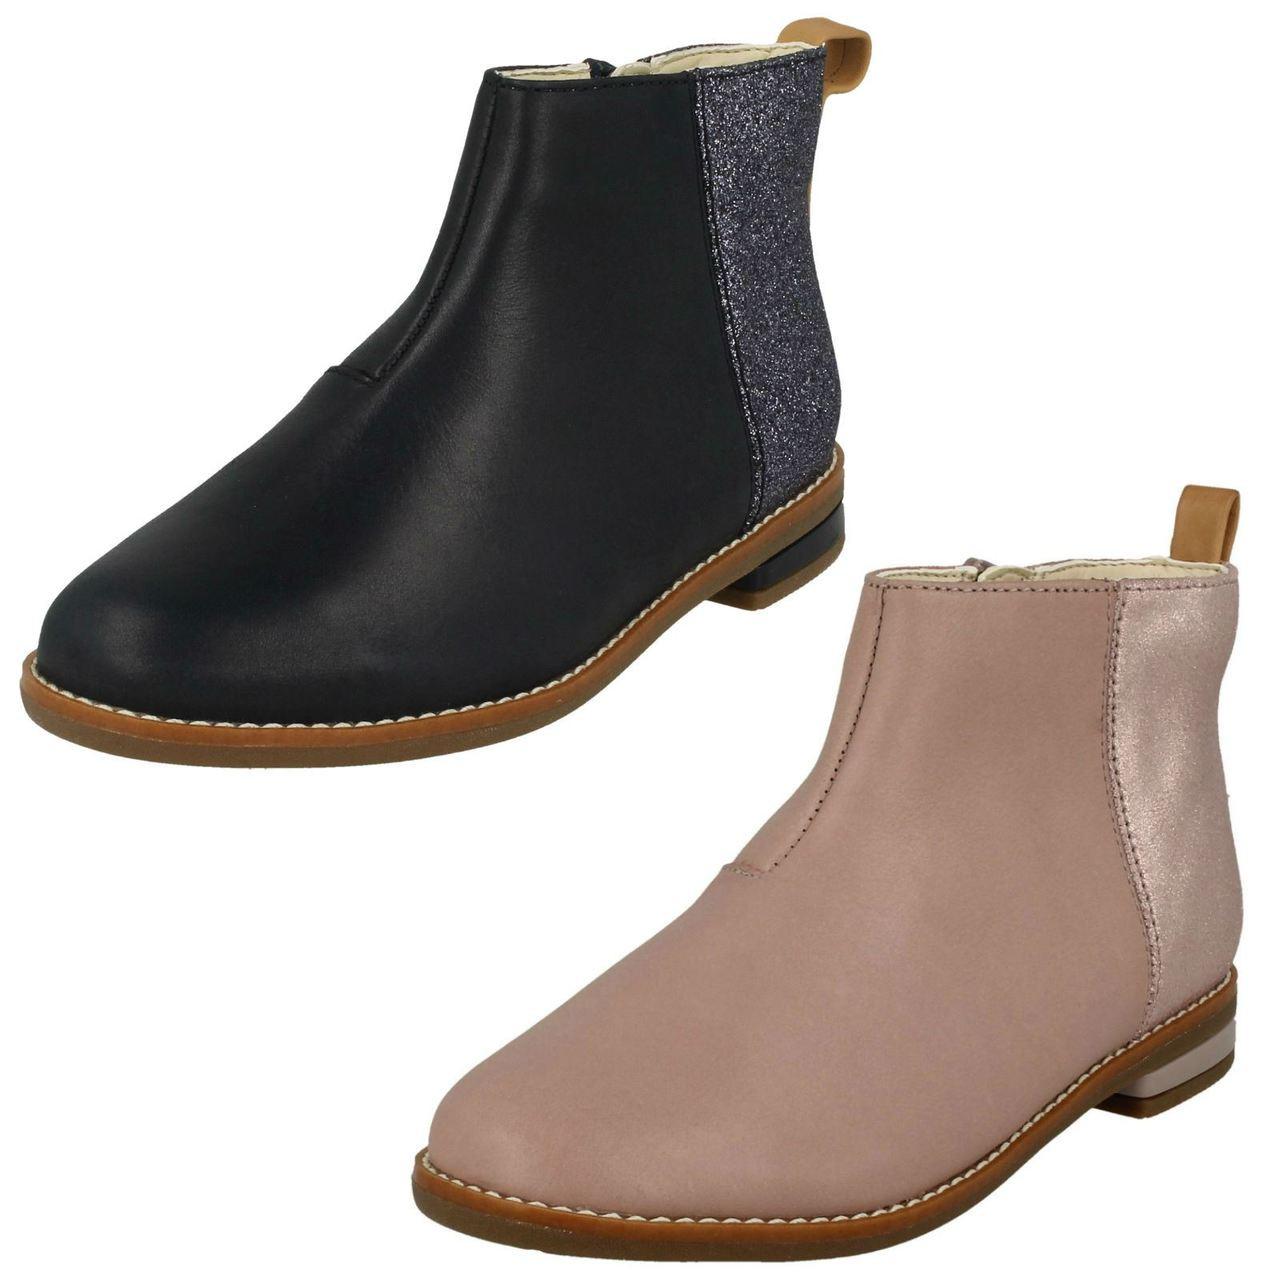 Girls Clarks Smart Ankle Boots Drew Fun